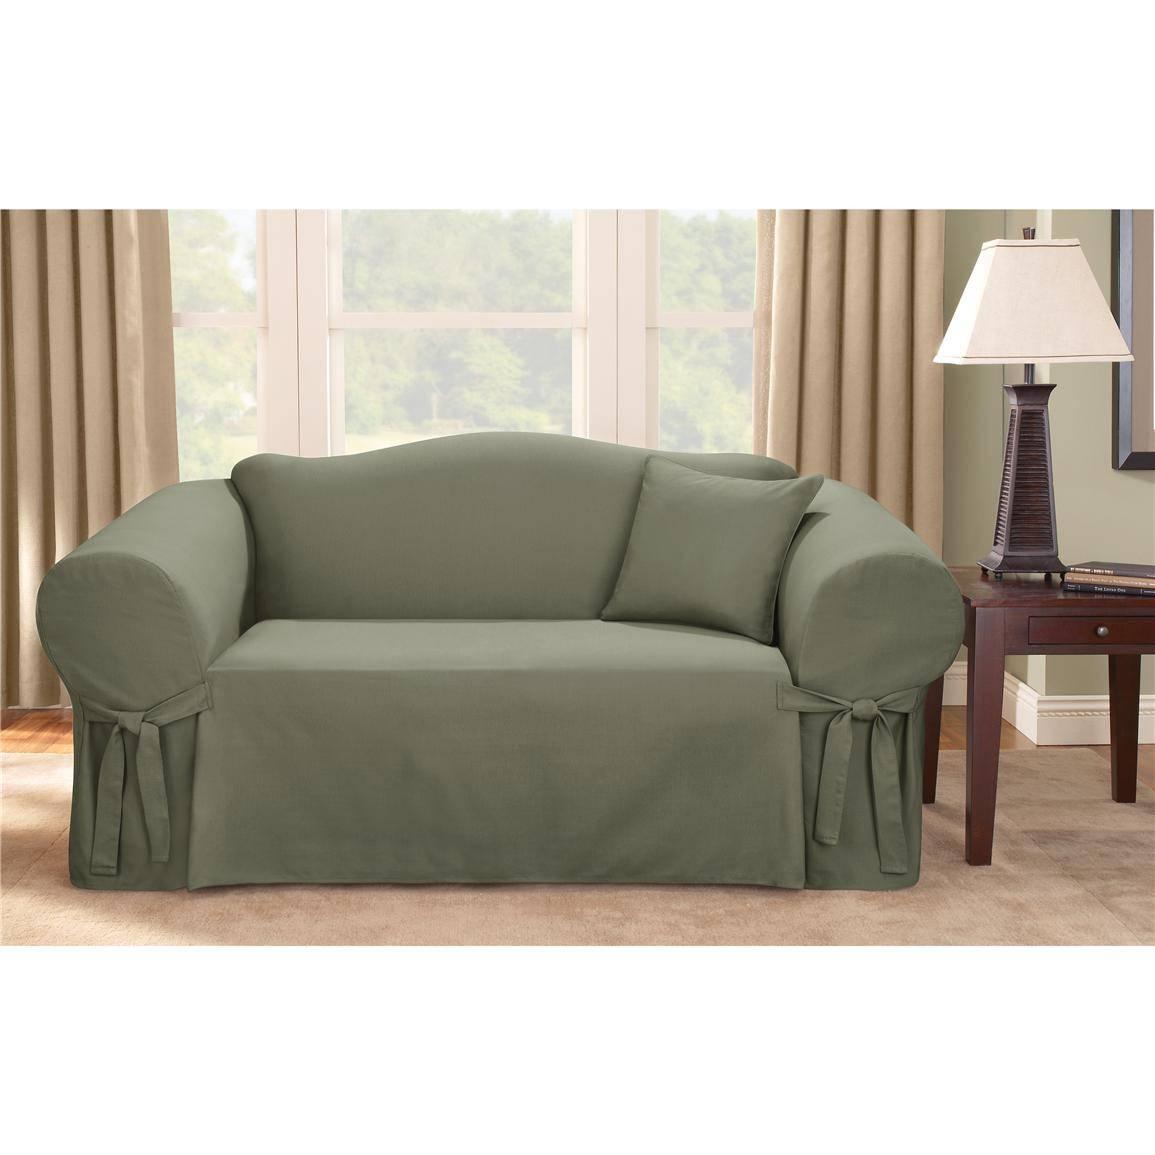 Sure Fit® Logan Sofa Slipcover - 292830, Furniture Covers At in Black Sofa Slipcovers (Image 14 of 15)